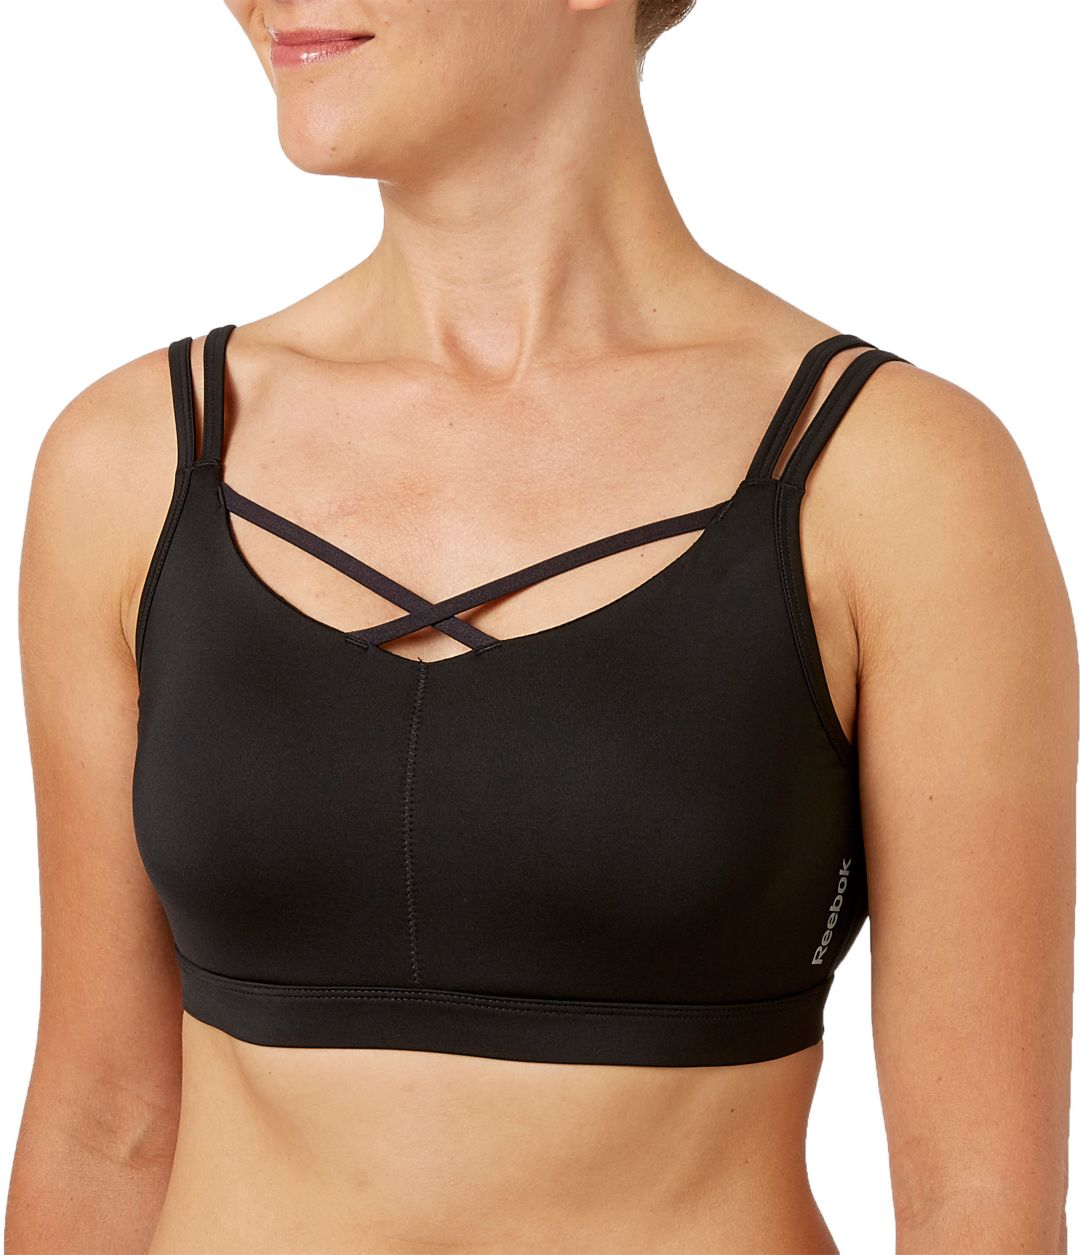 Sporting Goods Sizes S,M,L,XL Sports Bras New Women's Reebok Performance Sports Seamless Bra Top